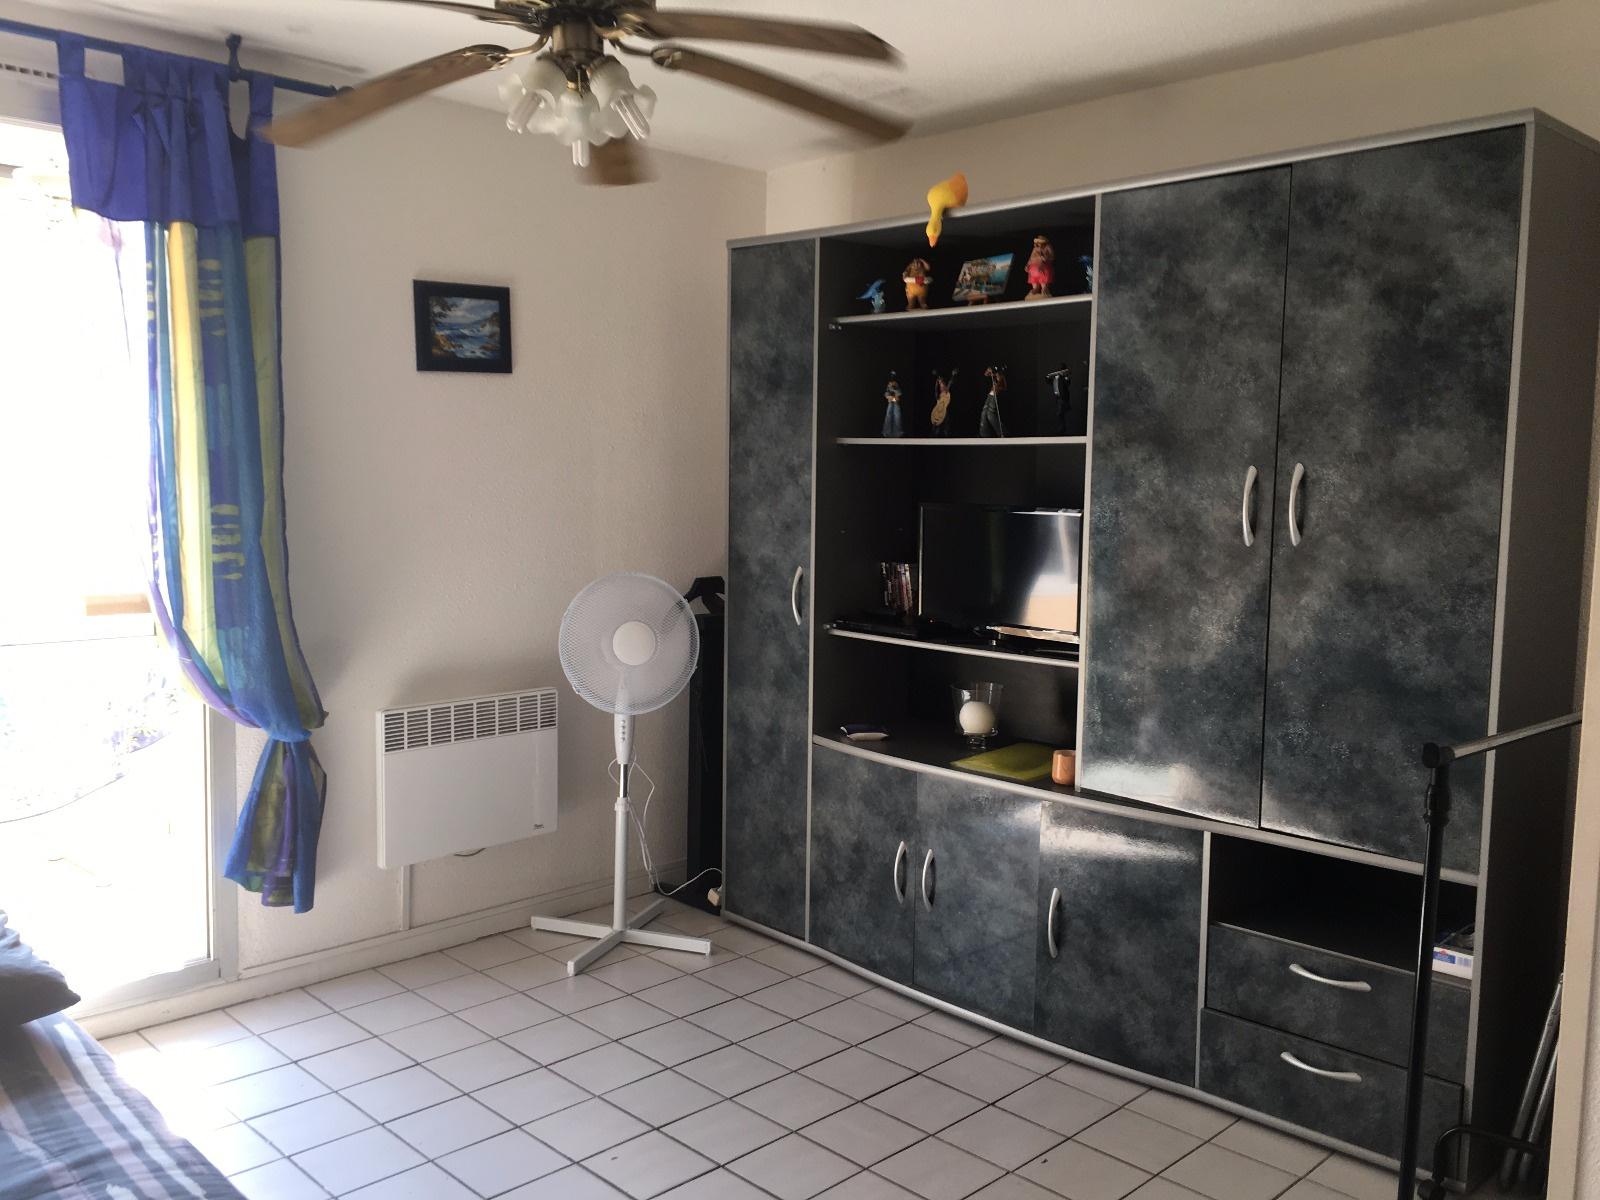 vente cap d 39 agde plage du mole joli studio cabine avec loggia vitr e. Black Bedroom Furniture Sets. Home Design Ideas